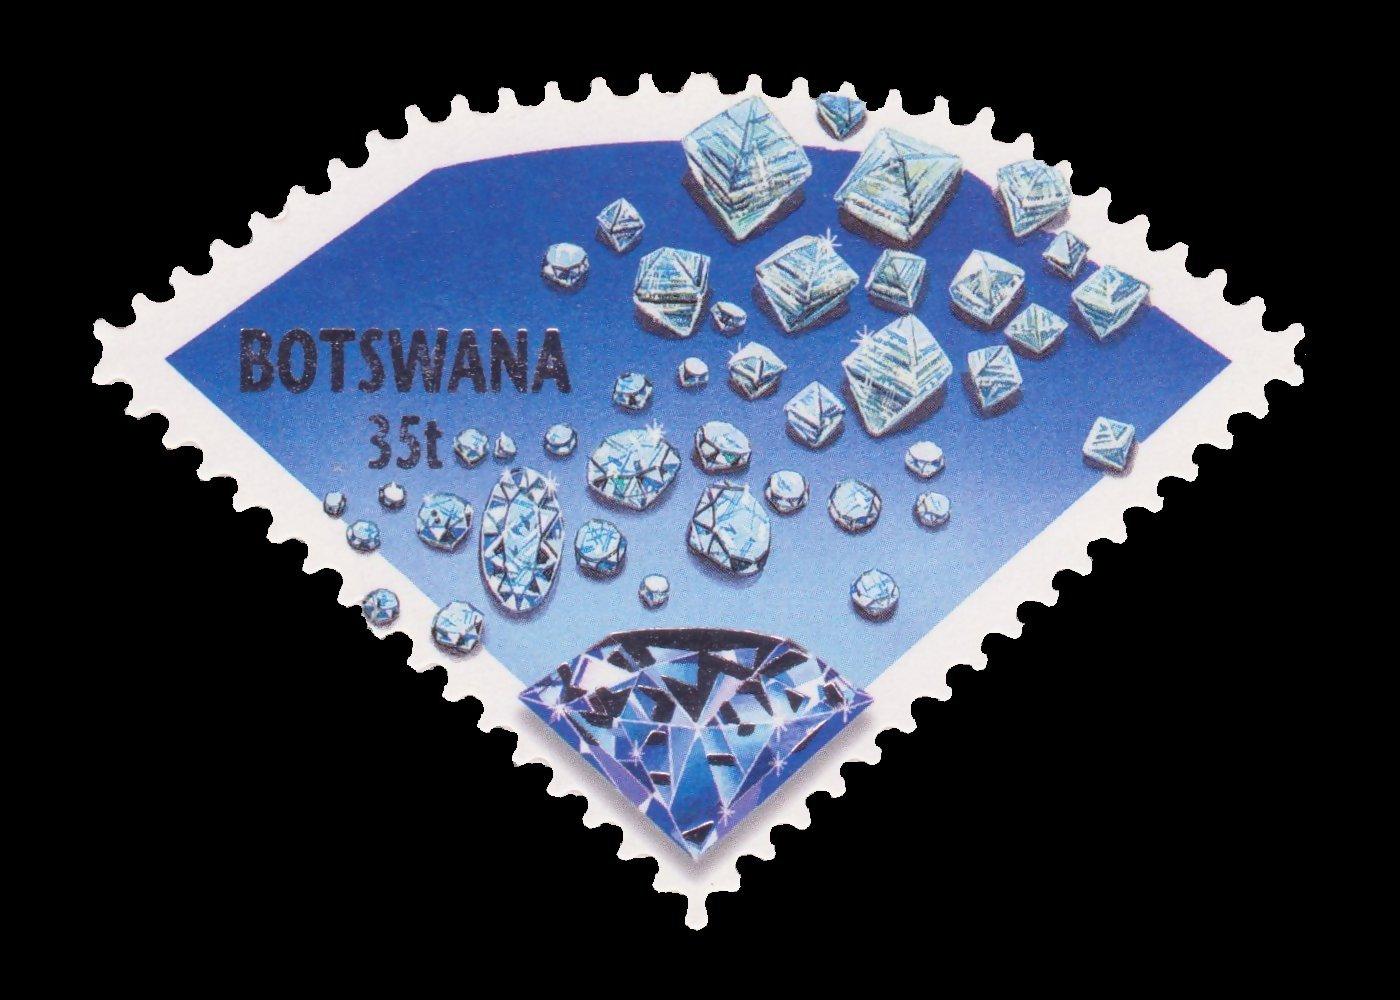 Botswana February Diamond Exports +29% Over 2015, Down ...